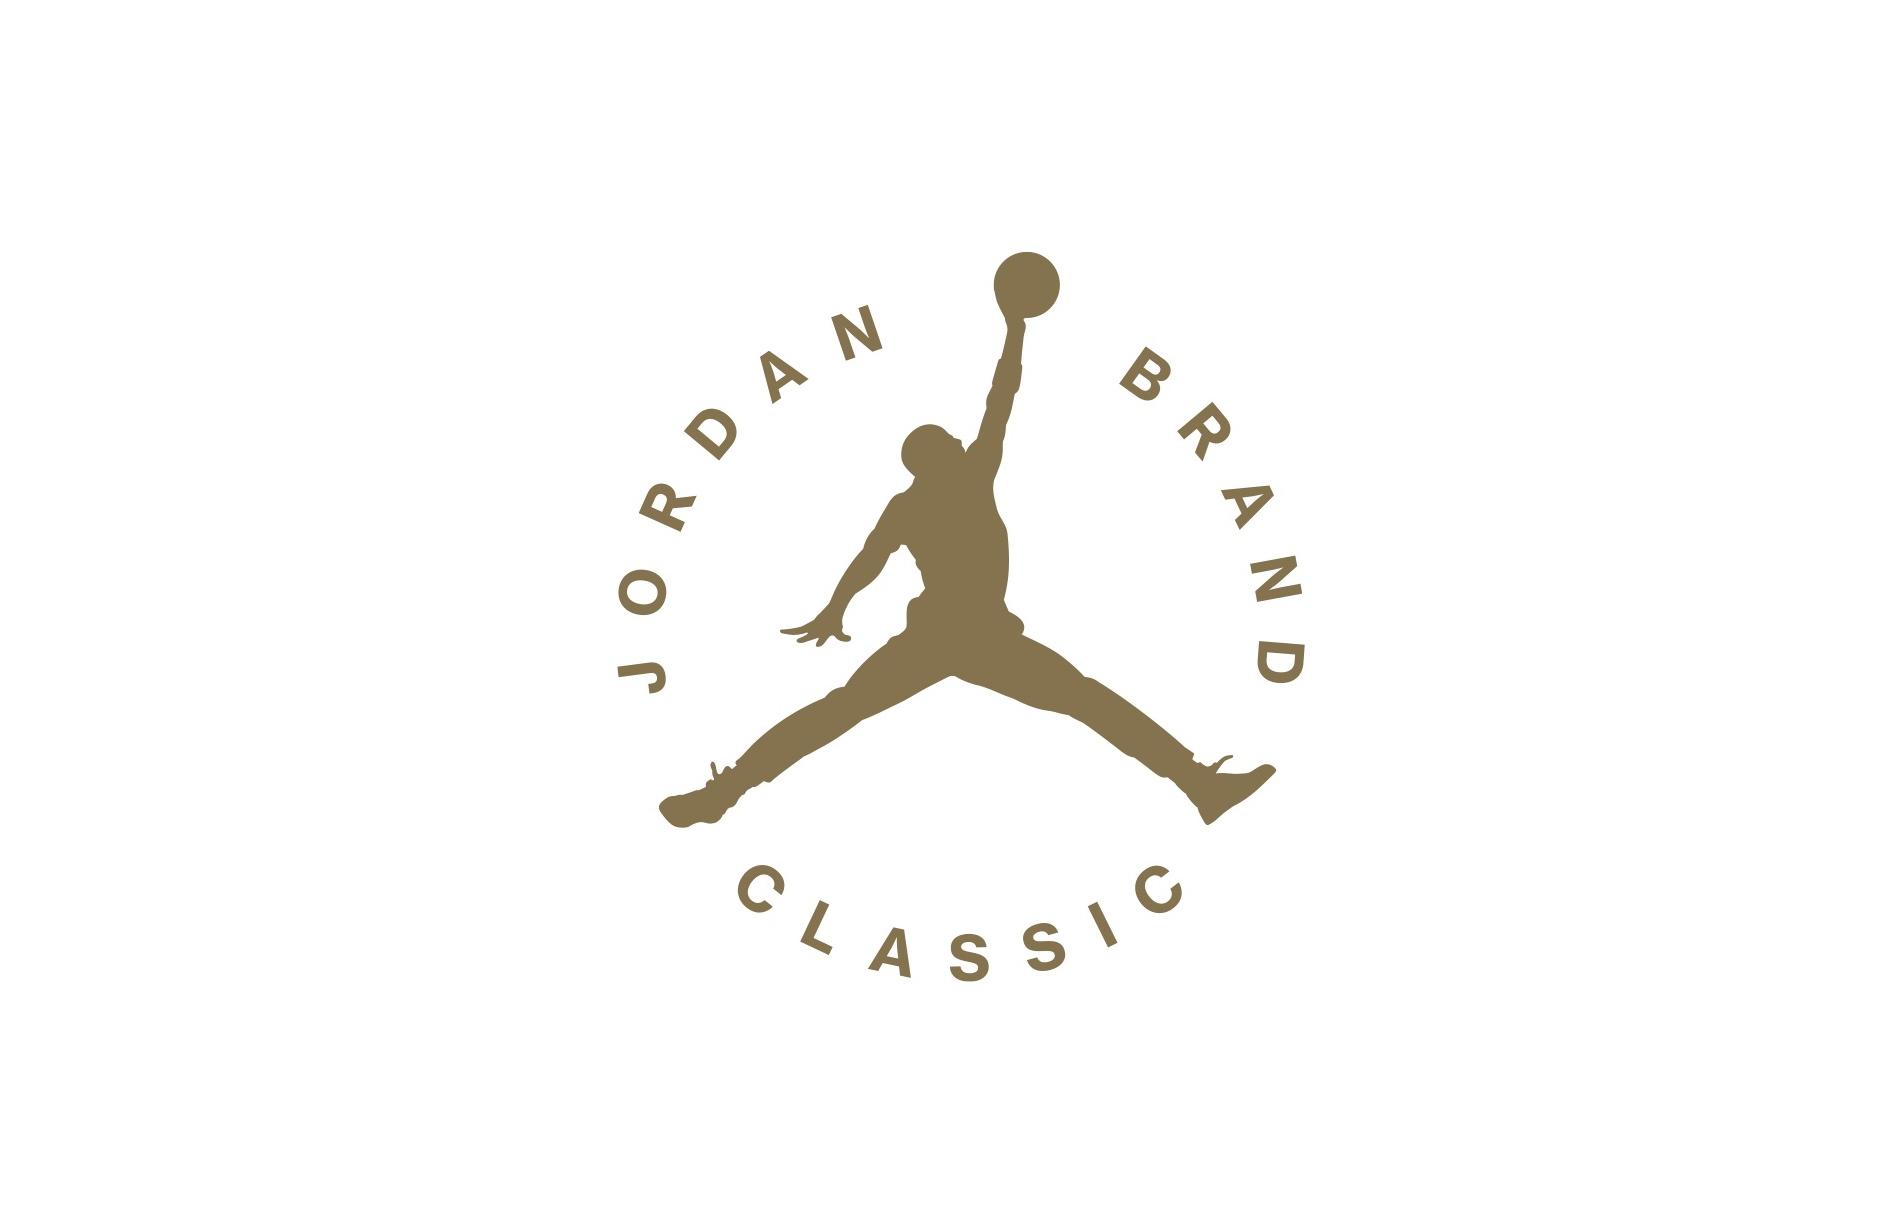 Jordan Brand Classic Official 2014 Roster Announced Nike